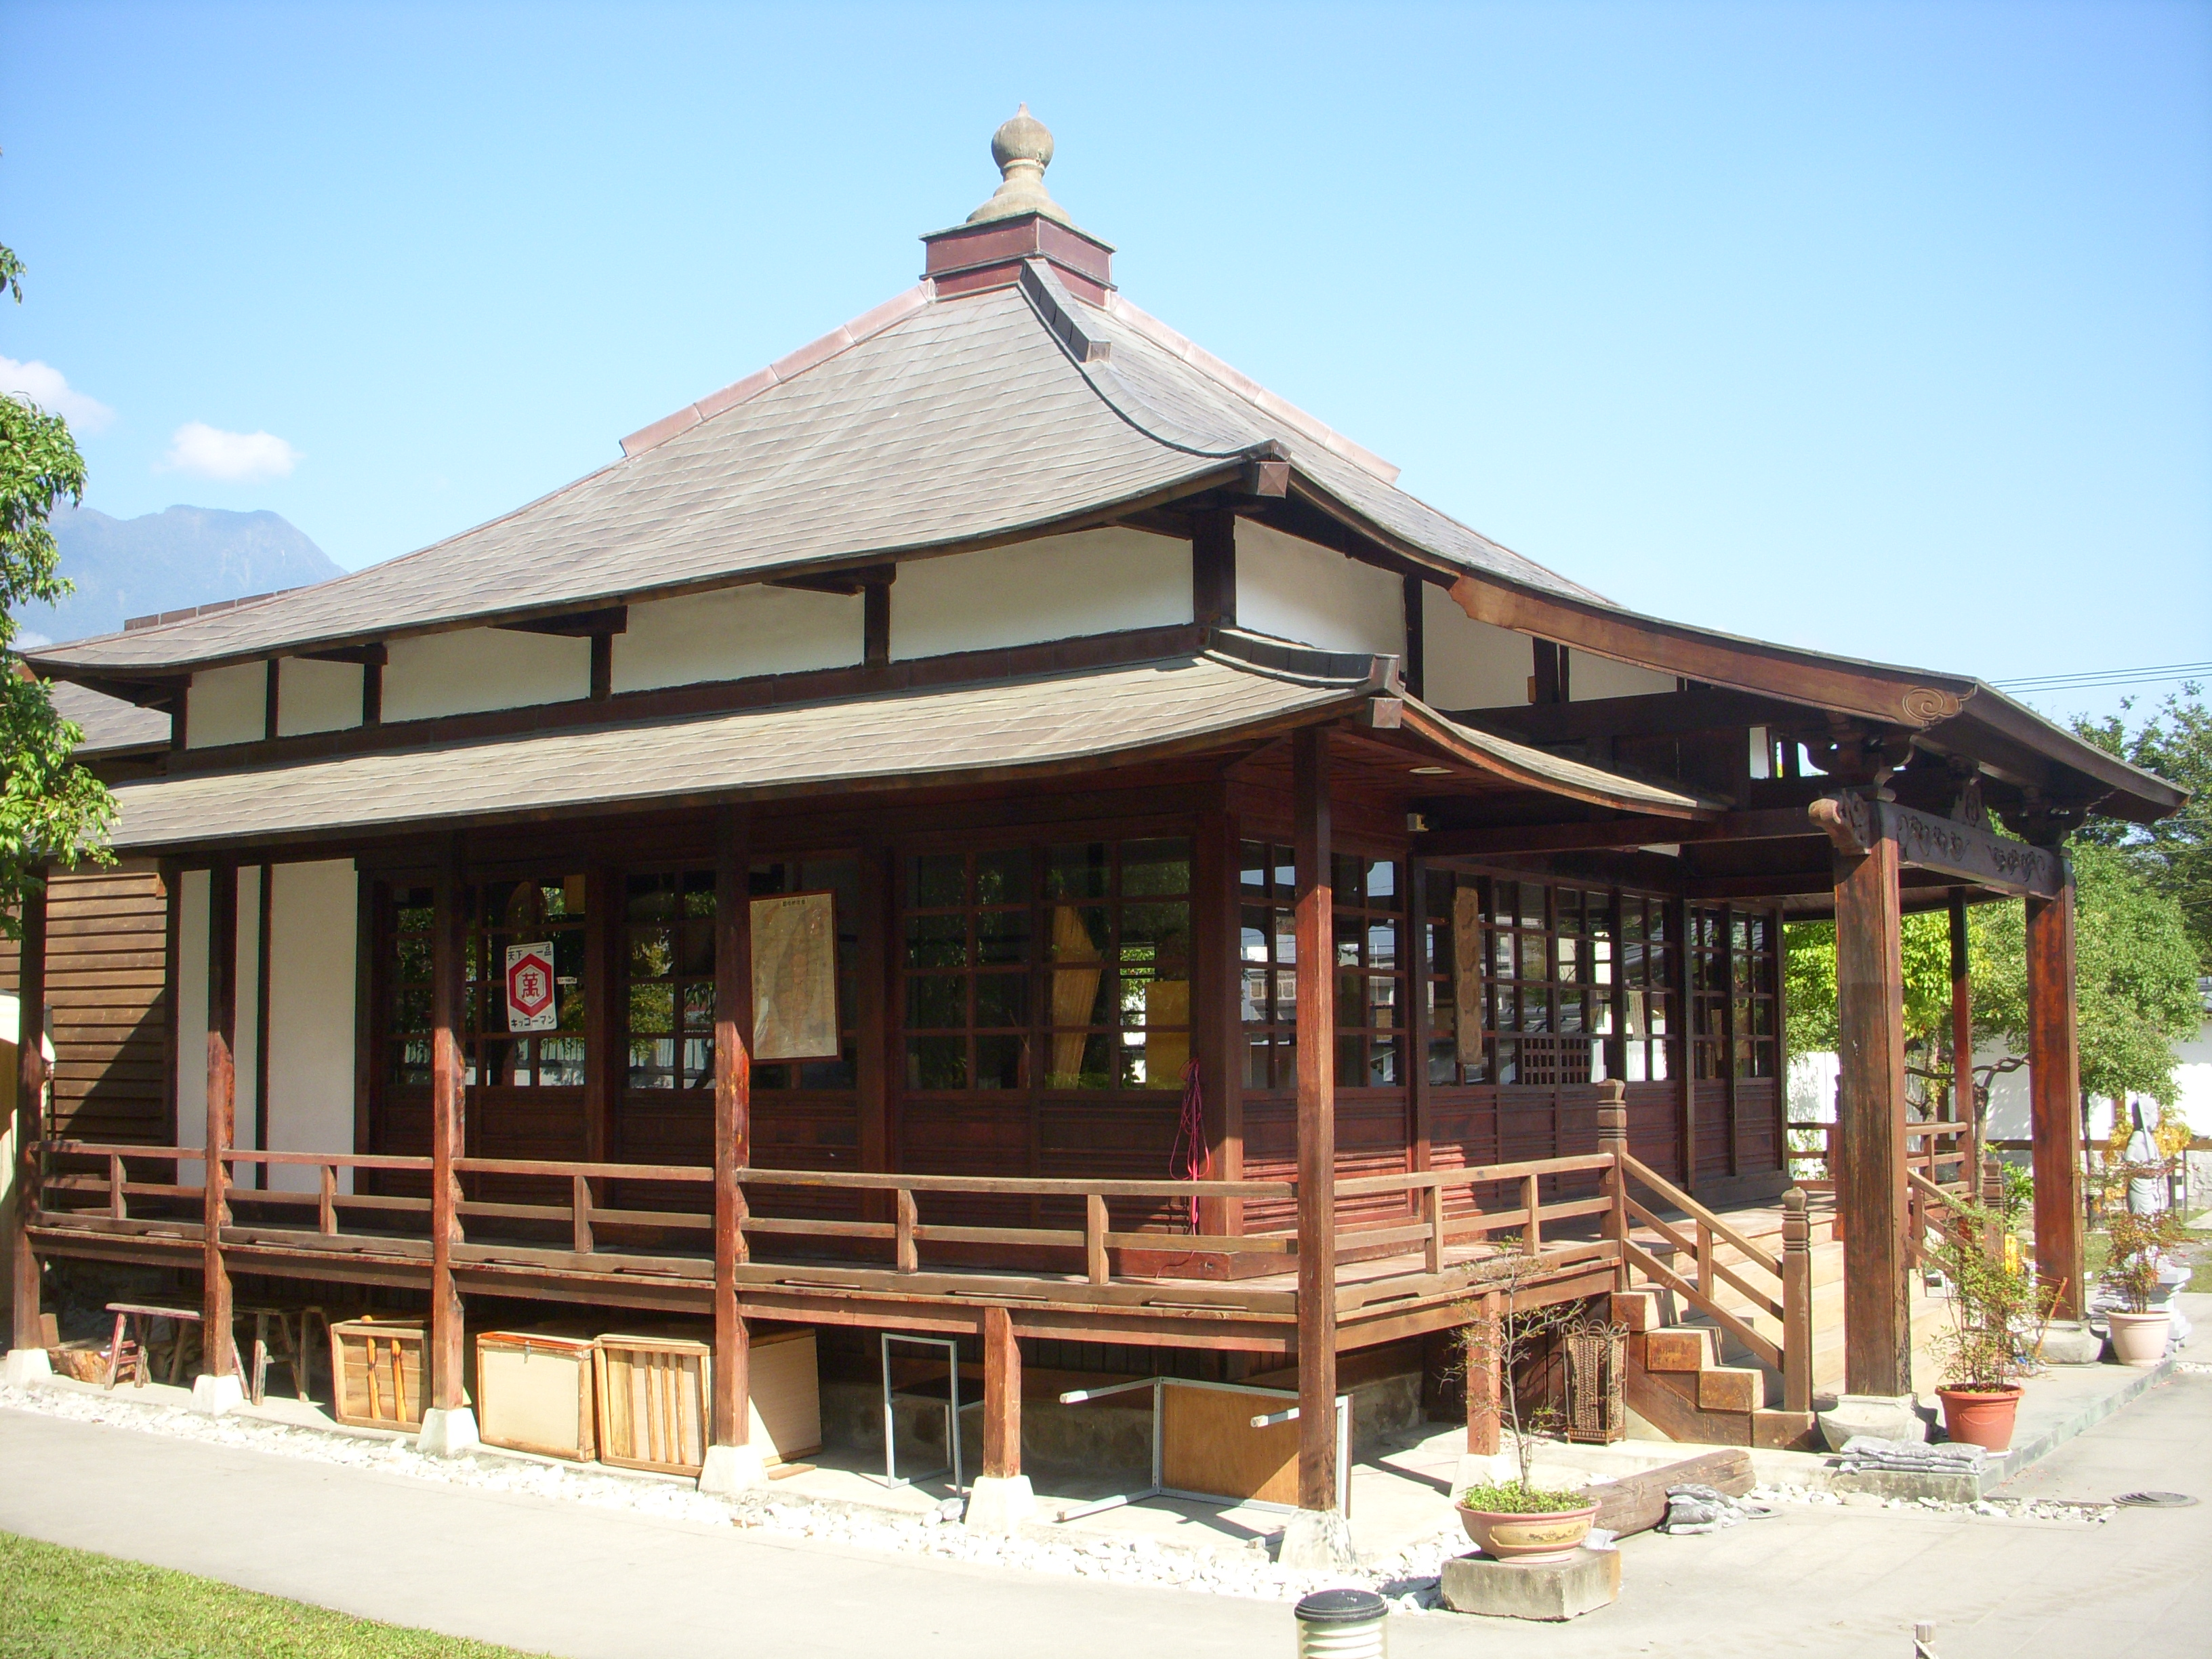 File:吉安慶修院 花蓮縣 縣(市)定古蹟寺廟 Venation 1.JPG